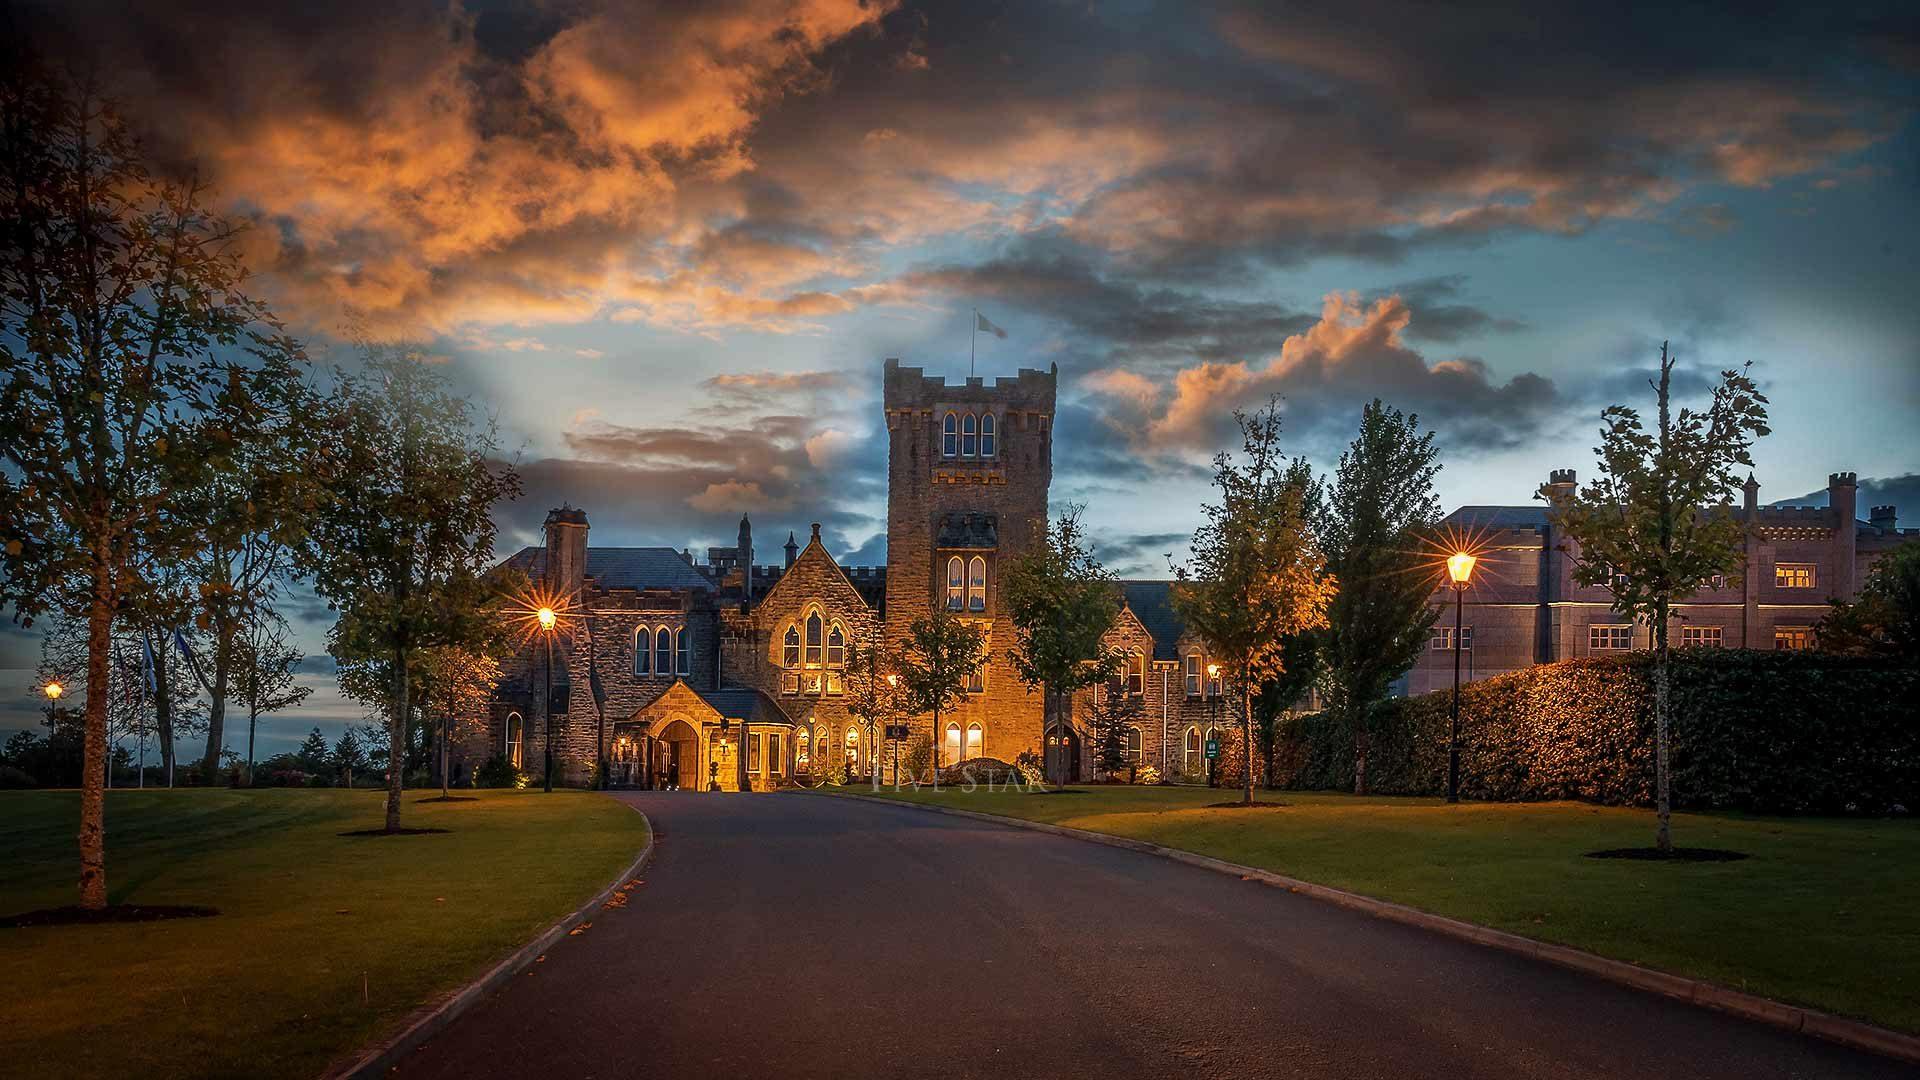 Kilronan Castle photo 1